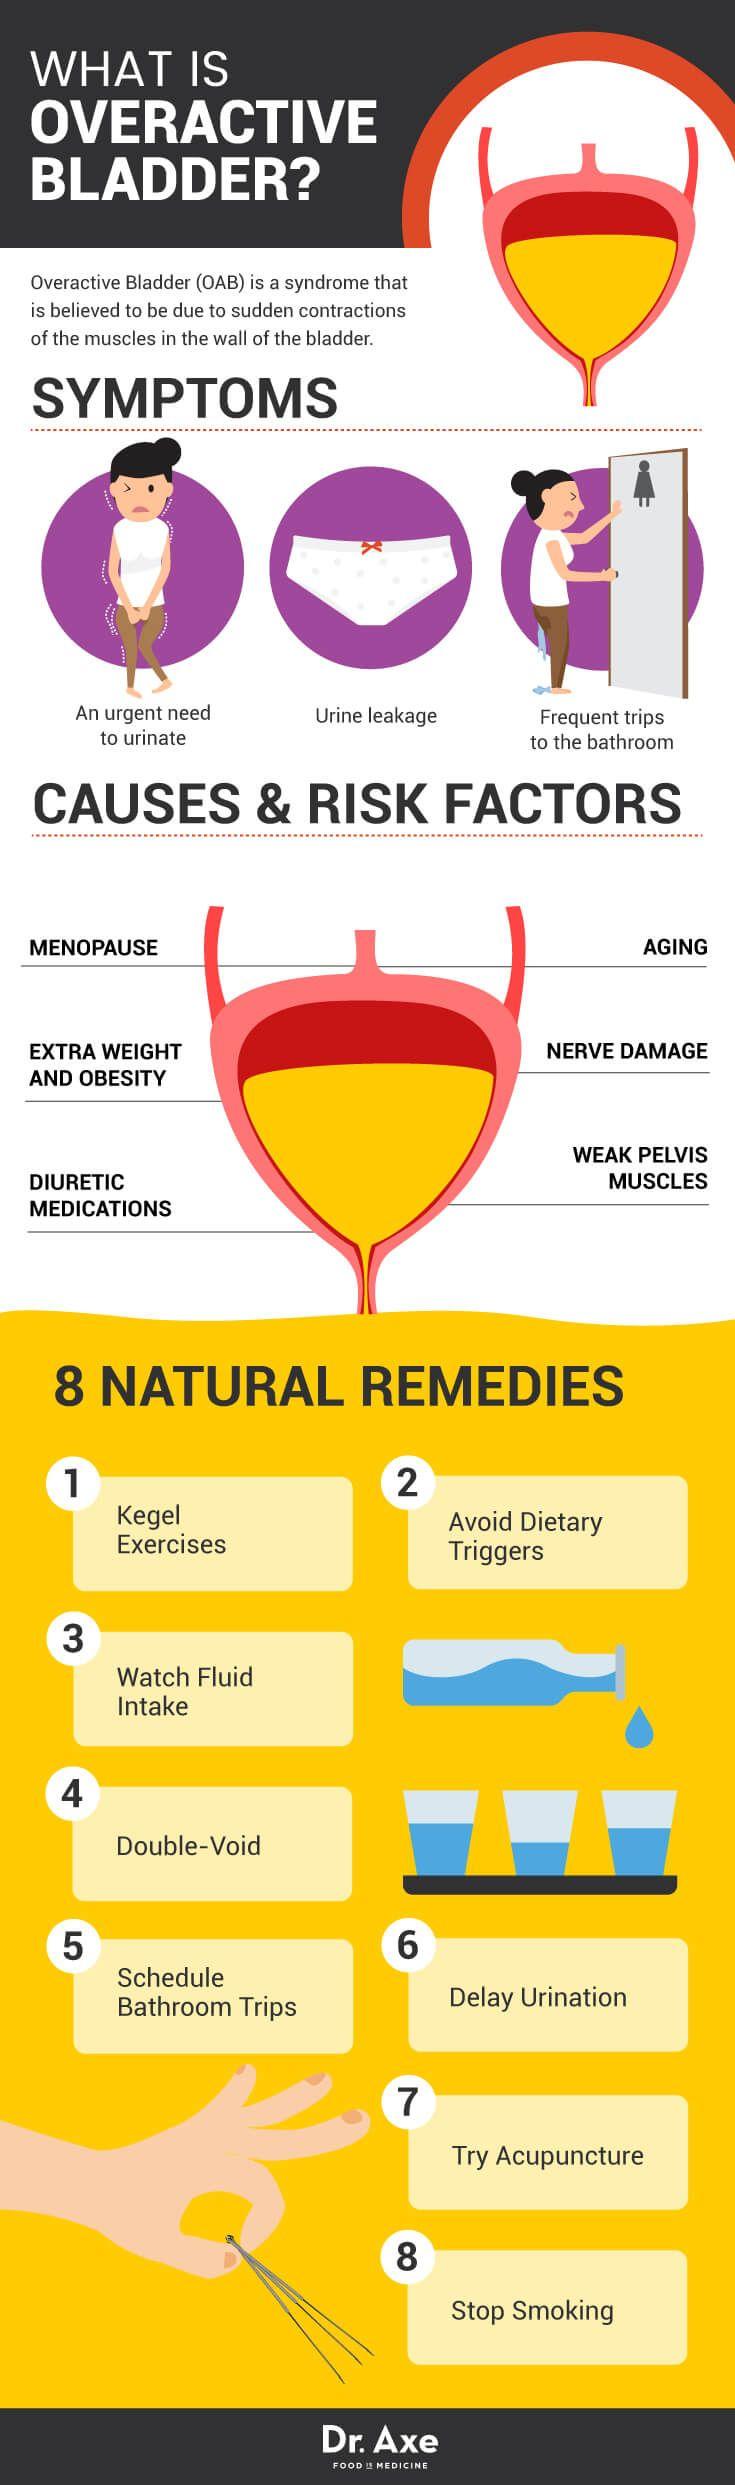 Nocturia Treatment Natural